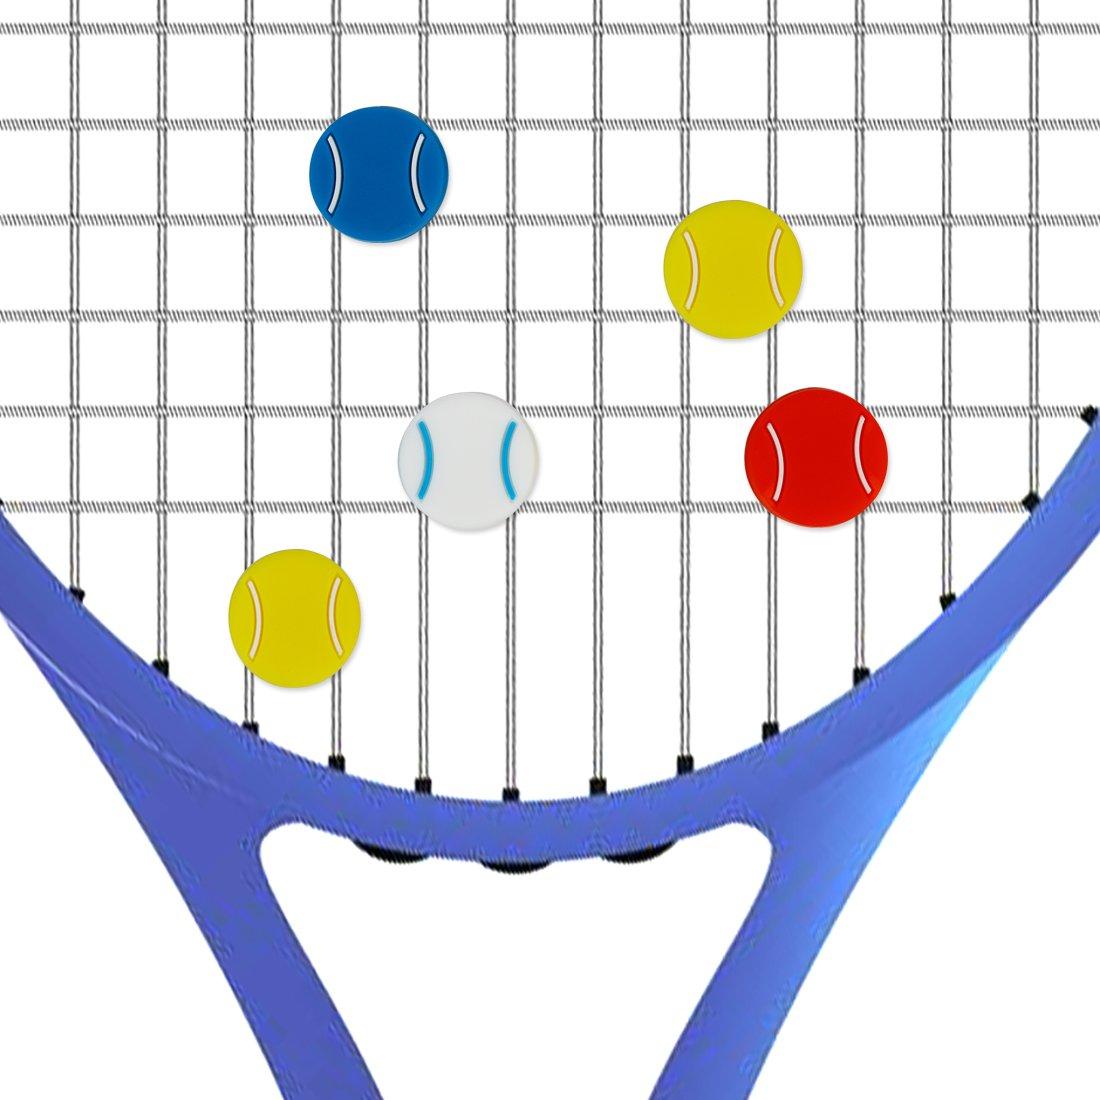 Andux Tennis Racket Vibration Dampener Silicona Amortiguador Pack de 8 BZQ-03: Amazon.es: Deportes y aire libre